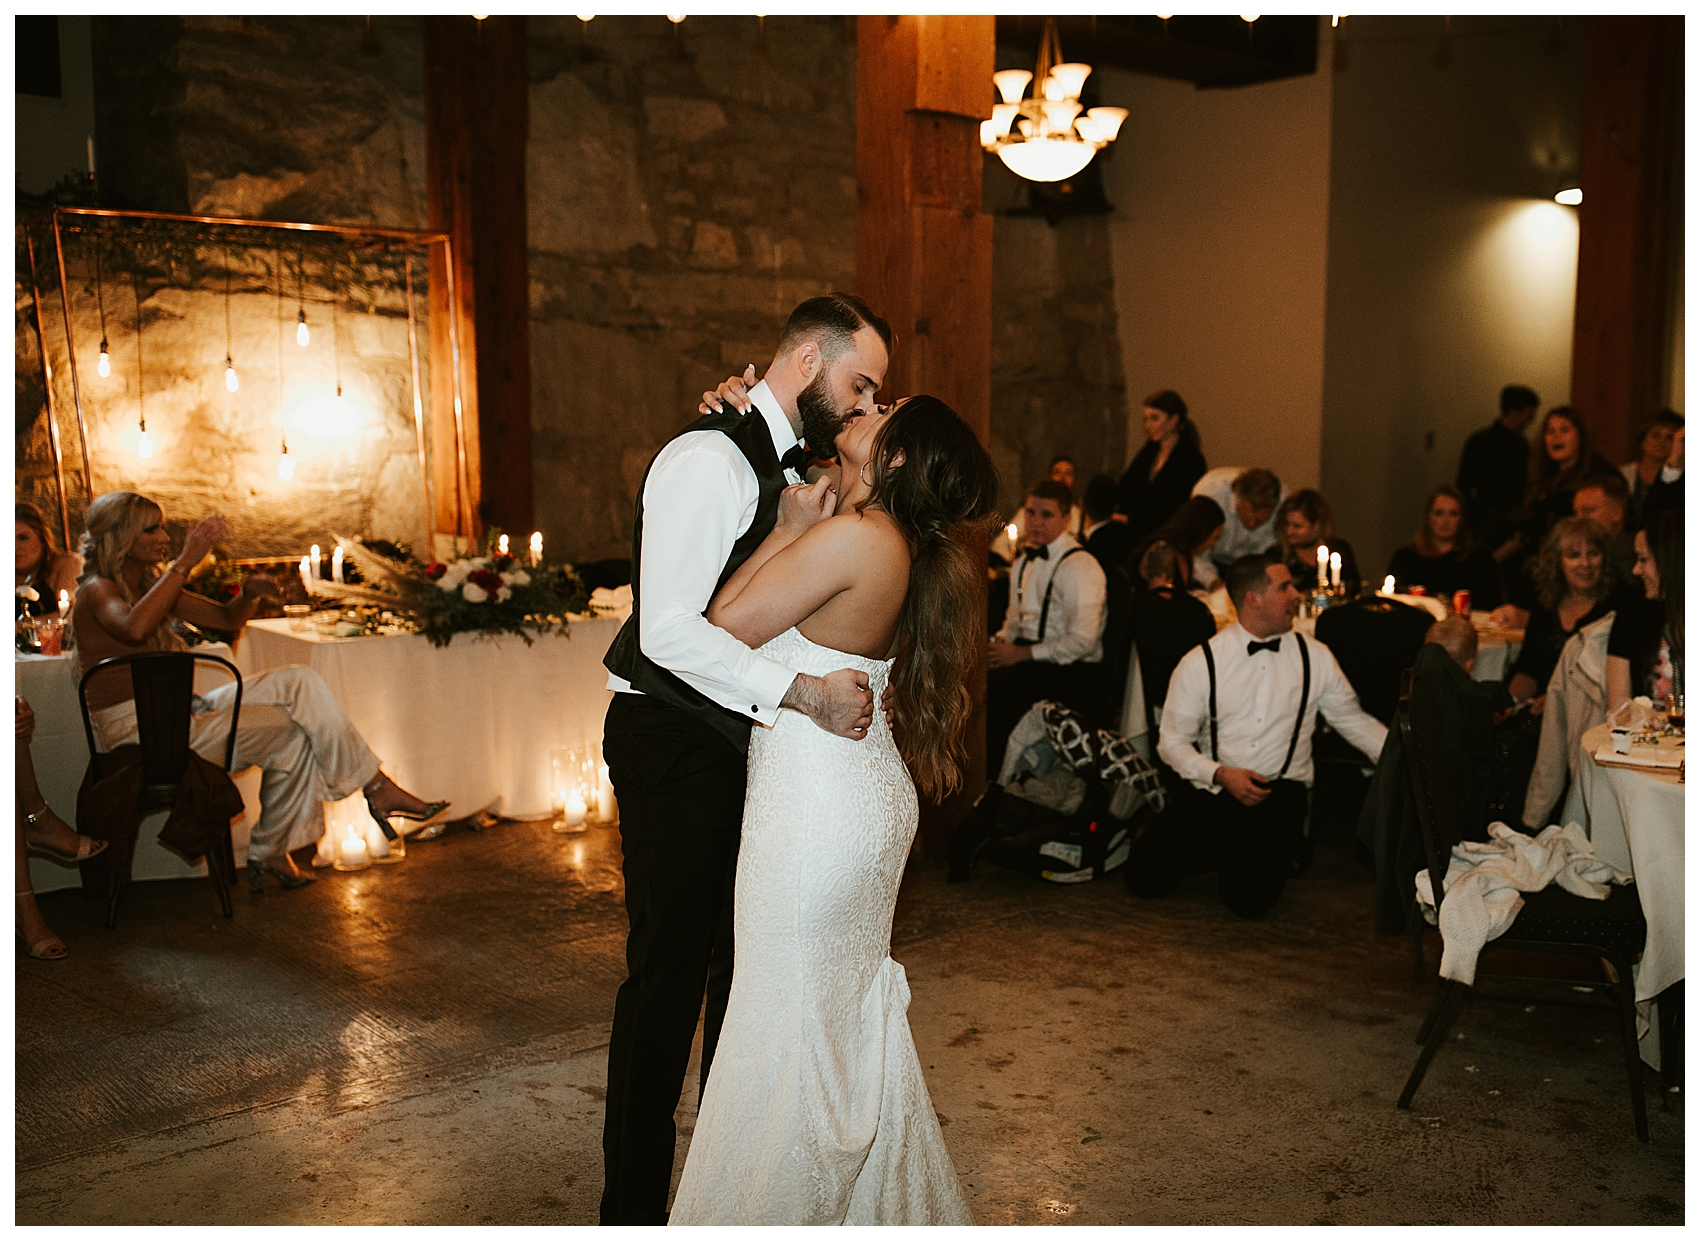 Chateau Rive Spokane Wedding Cassie Trottier Photography01116.jpg